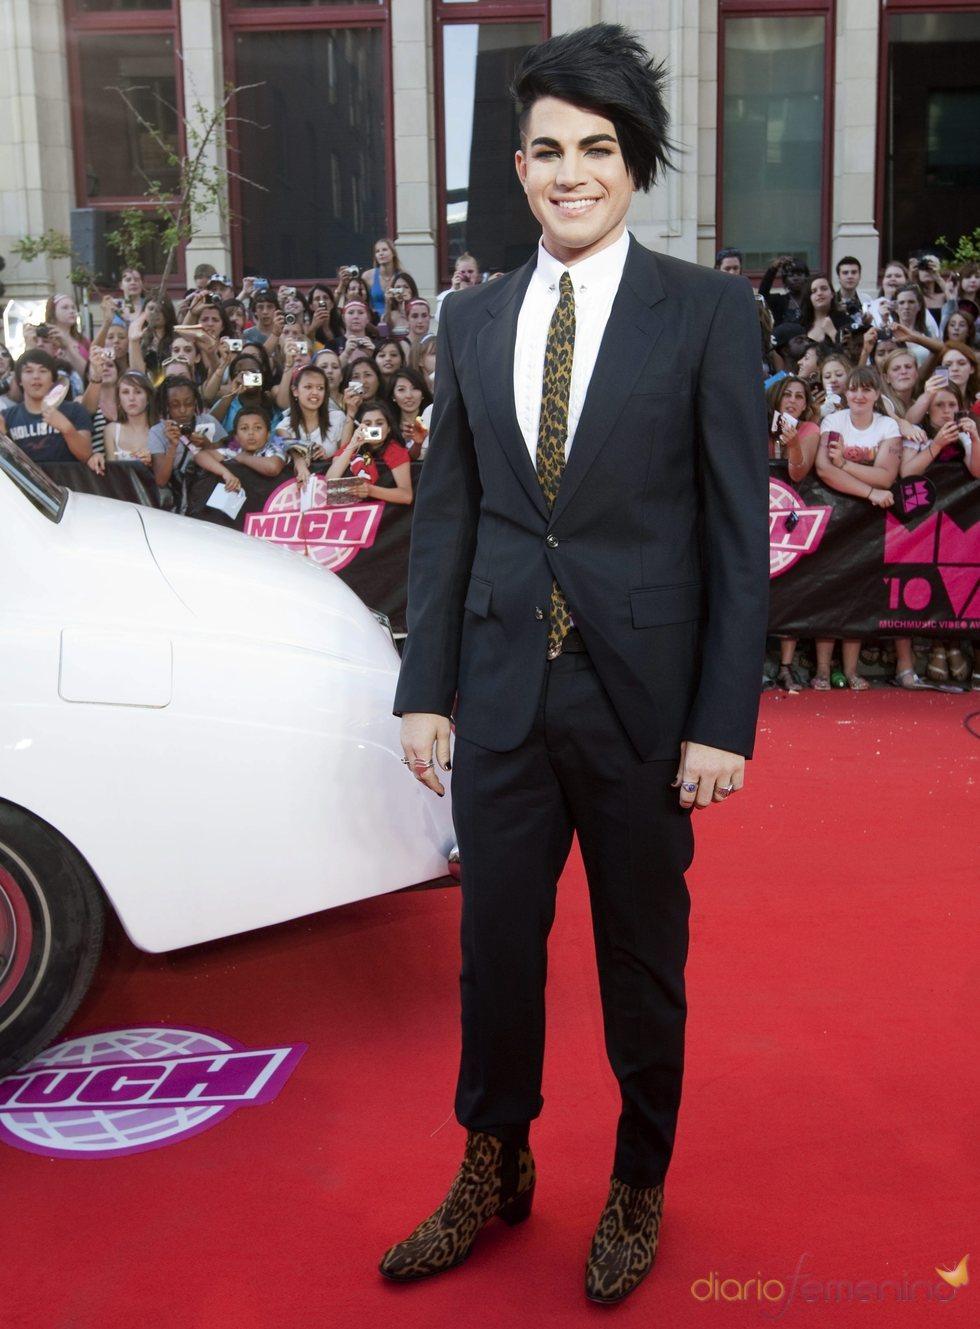 Adam Lambert posa en los premios MuchMusic